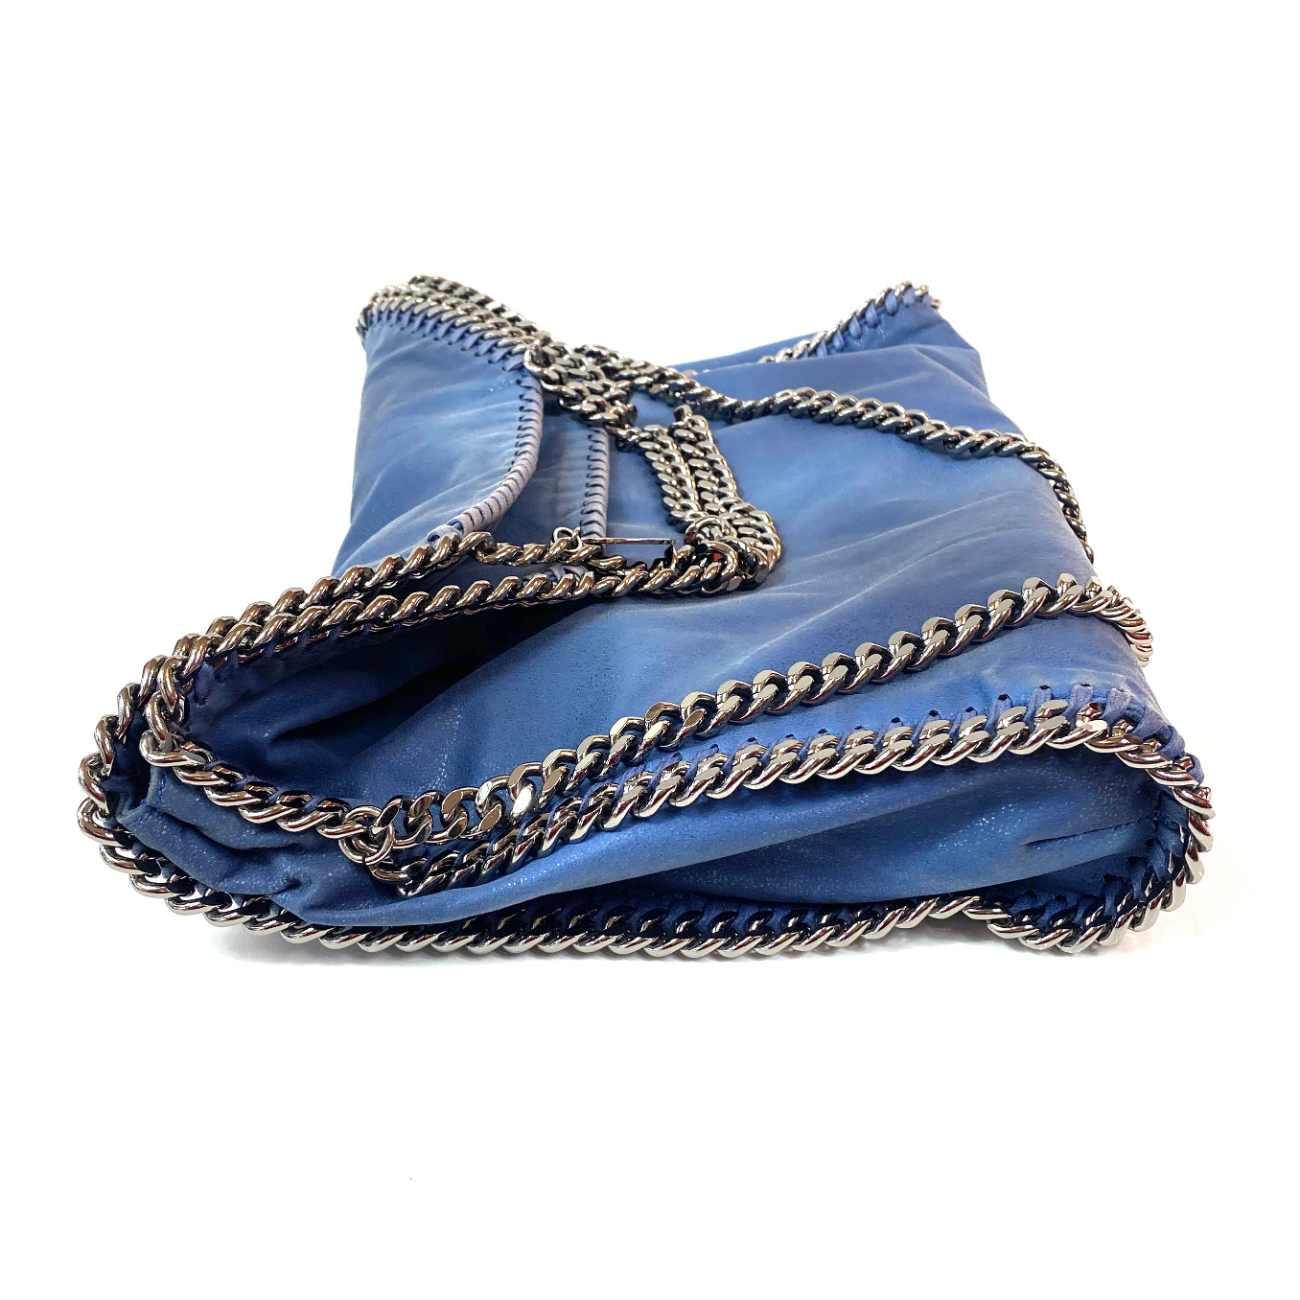 Bolsa Stella McCartney Falabella Azul